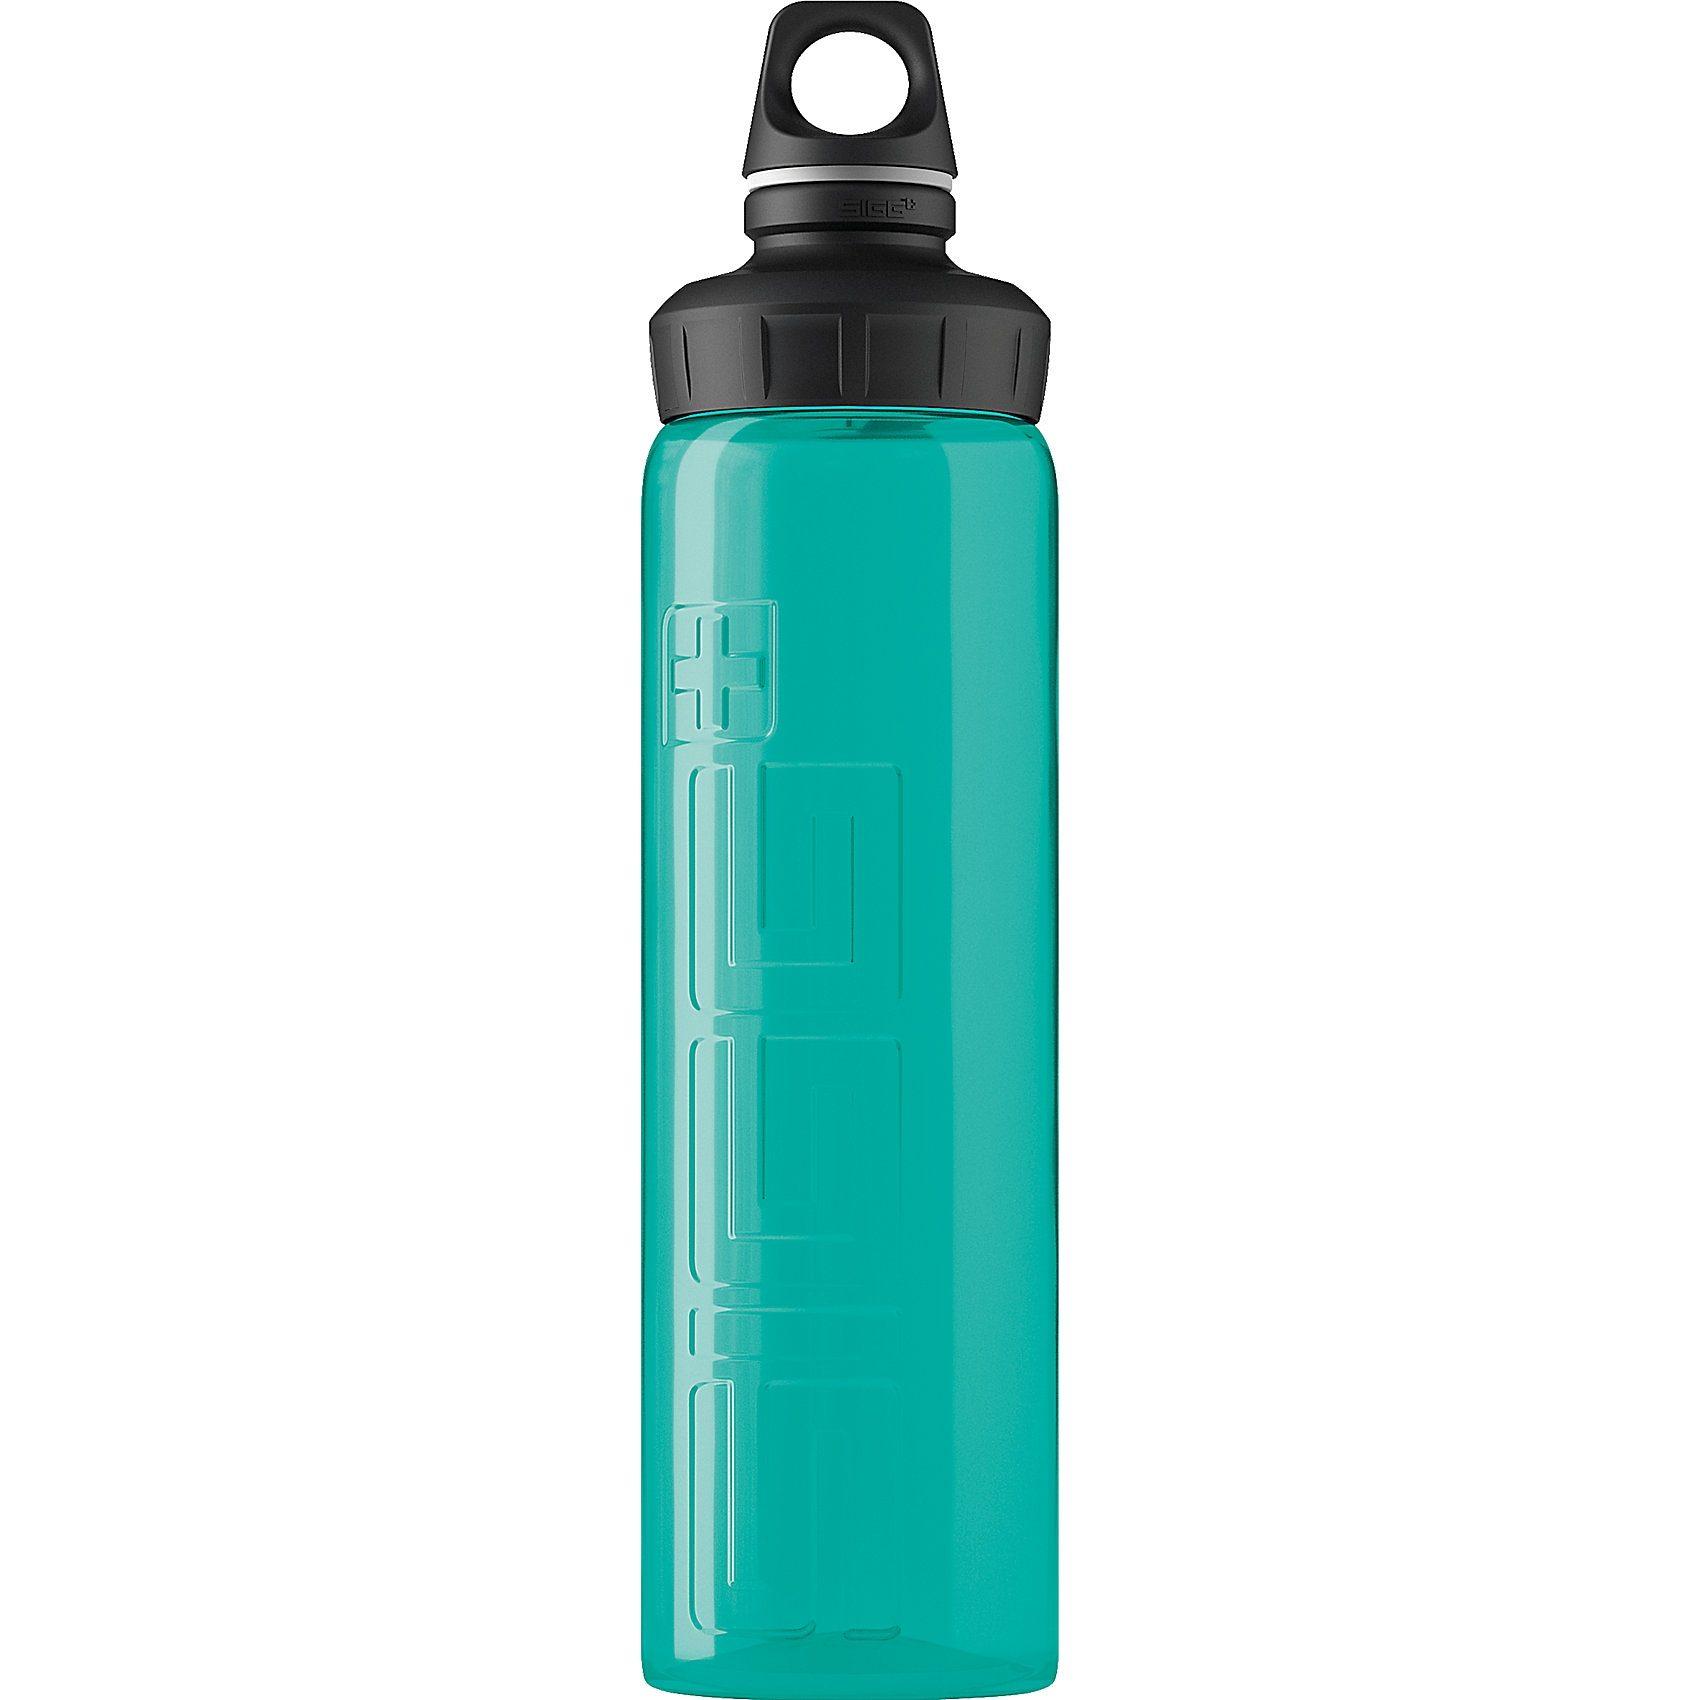 SIGG Trinkflasche VIVA Aqua transparent, 750 ml